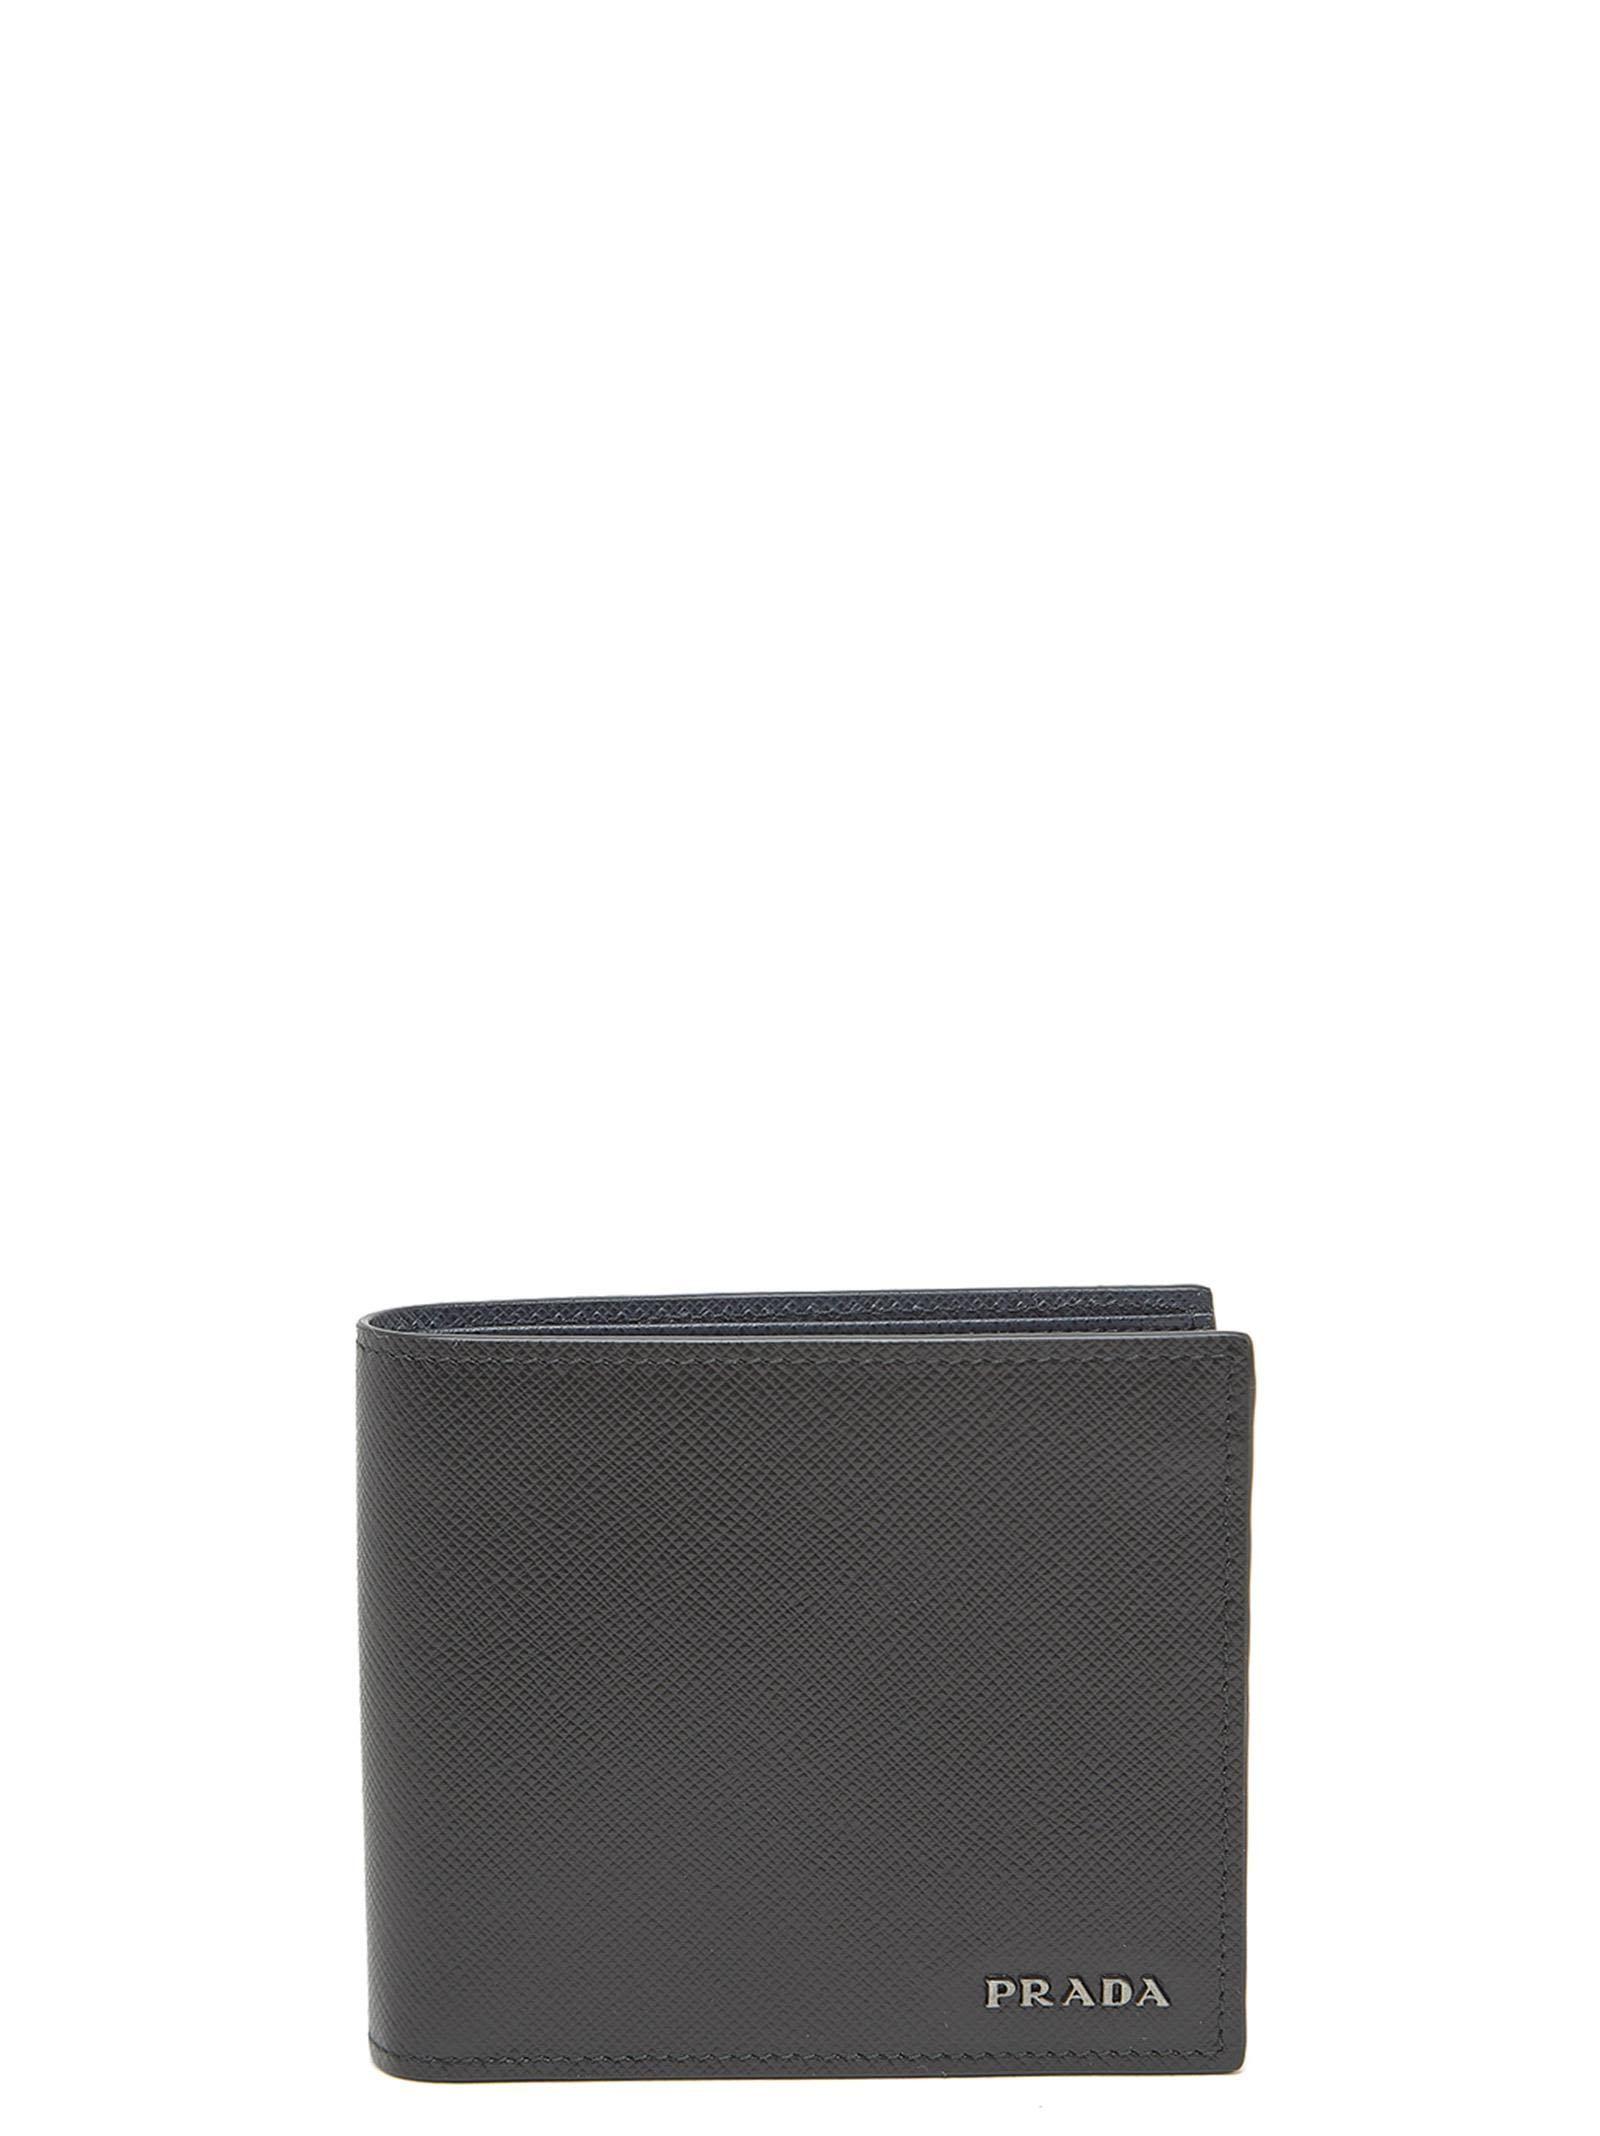 20953f57023a cheapest prada multicolor wallet da54d 3283a